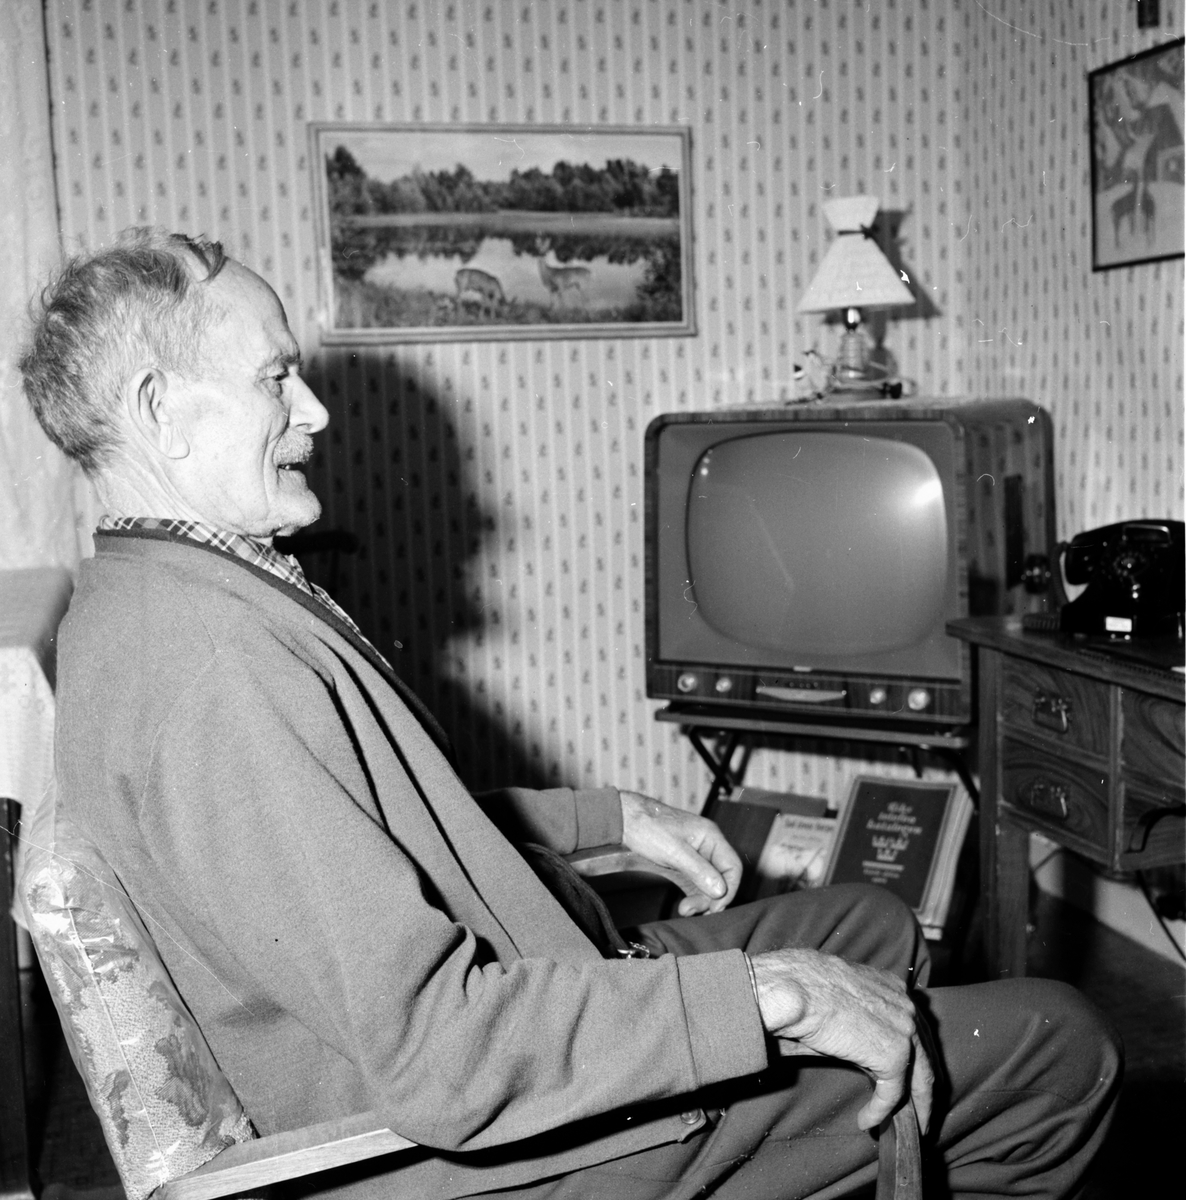 Lingbo, 86-årige Gustaf Olsson, 11 Dec 1964